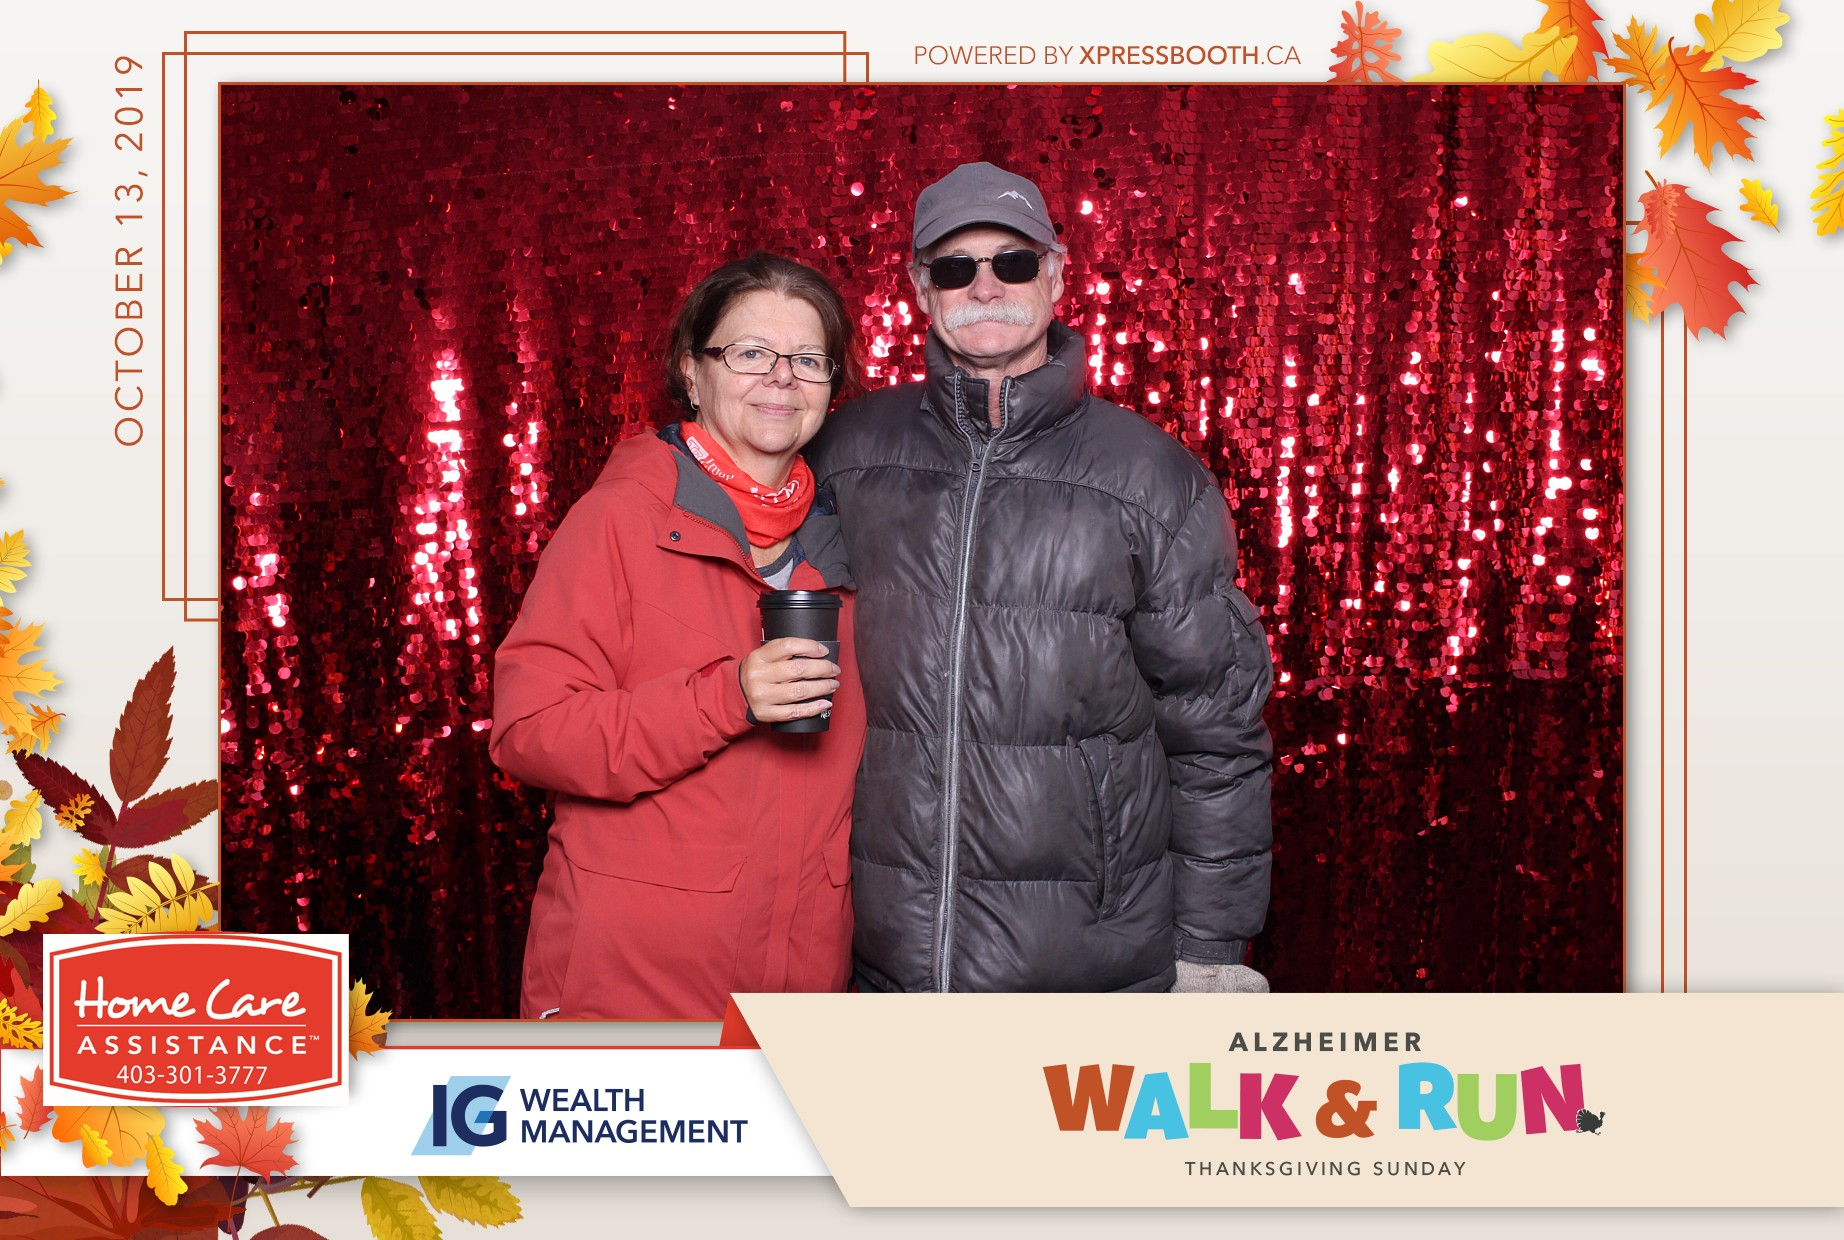 WalkRunAlzheimerSociety-0061-PRINT